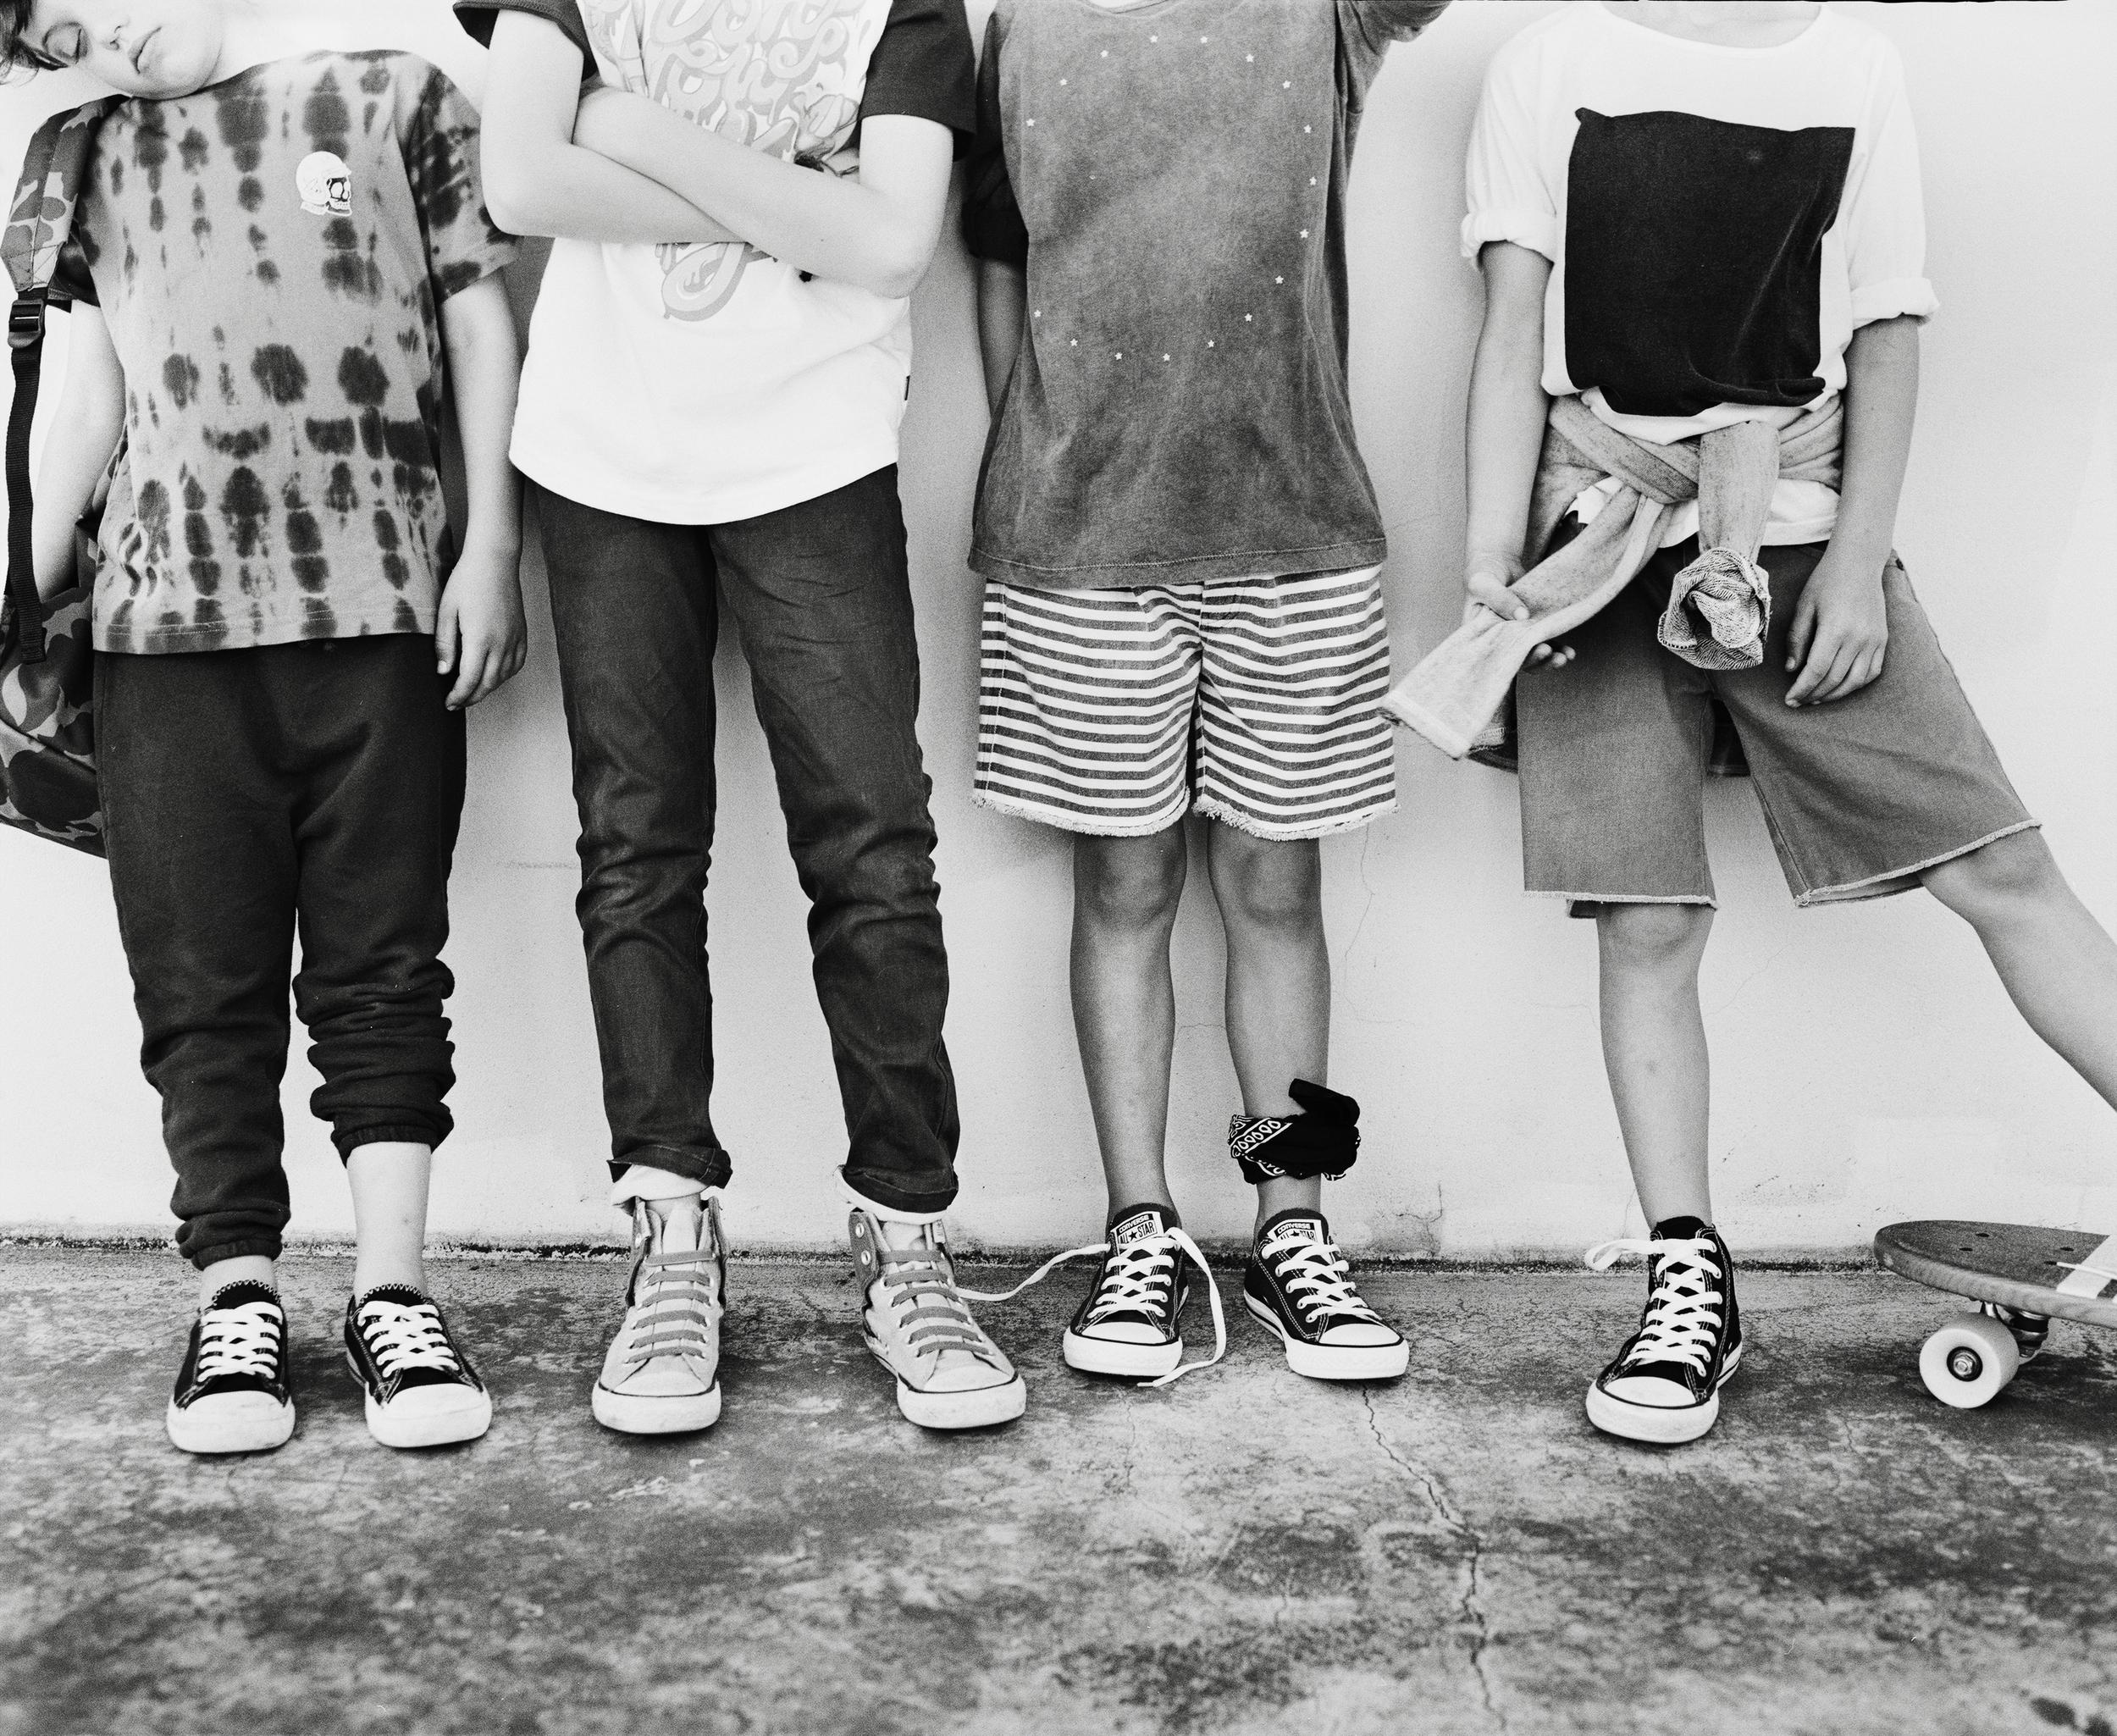 Harley wears: Munster tee   Nico Nico pants His own shoes Vans backpack   Kai wears: Munster tee andJeans   Converse hi tops  His own bracelets  Kody wears: Zuitton shirt andshorts  Converse low  Stylist's own bandana (worn on leg)  Joe wears: Zuitton tee   Nico Nico jumper  (worn around waist) Munster shorts   Converse hi tops   Worthy Skateboard